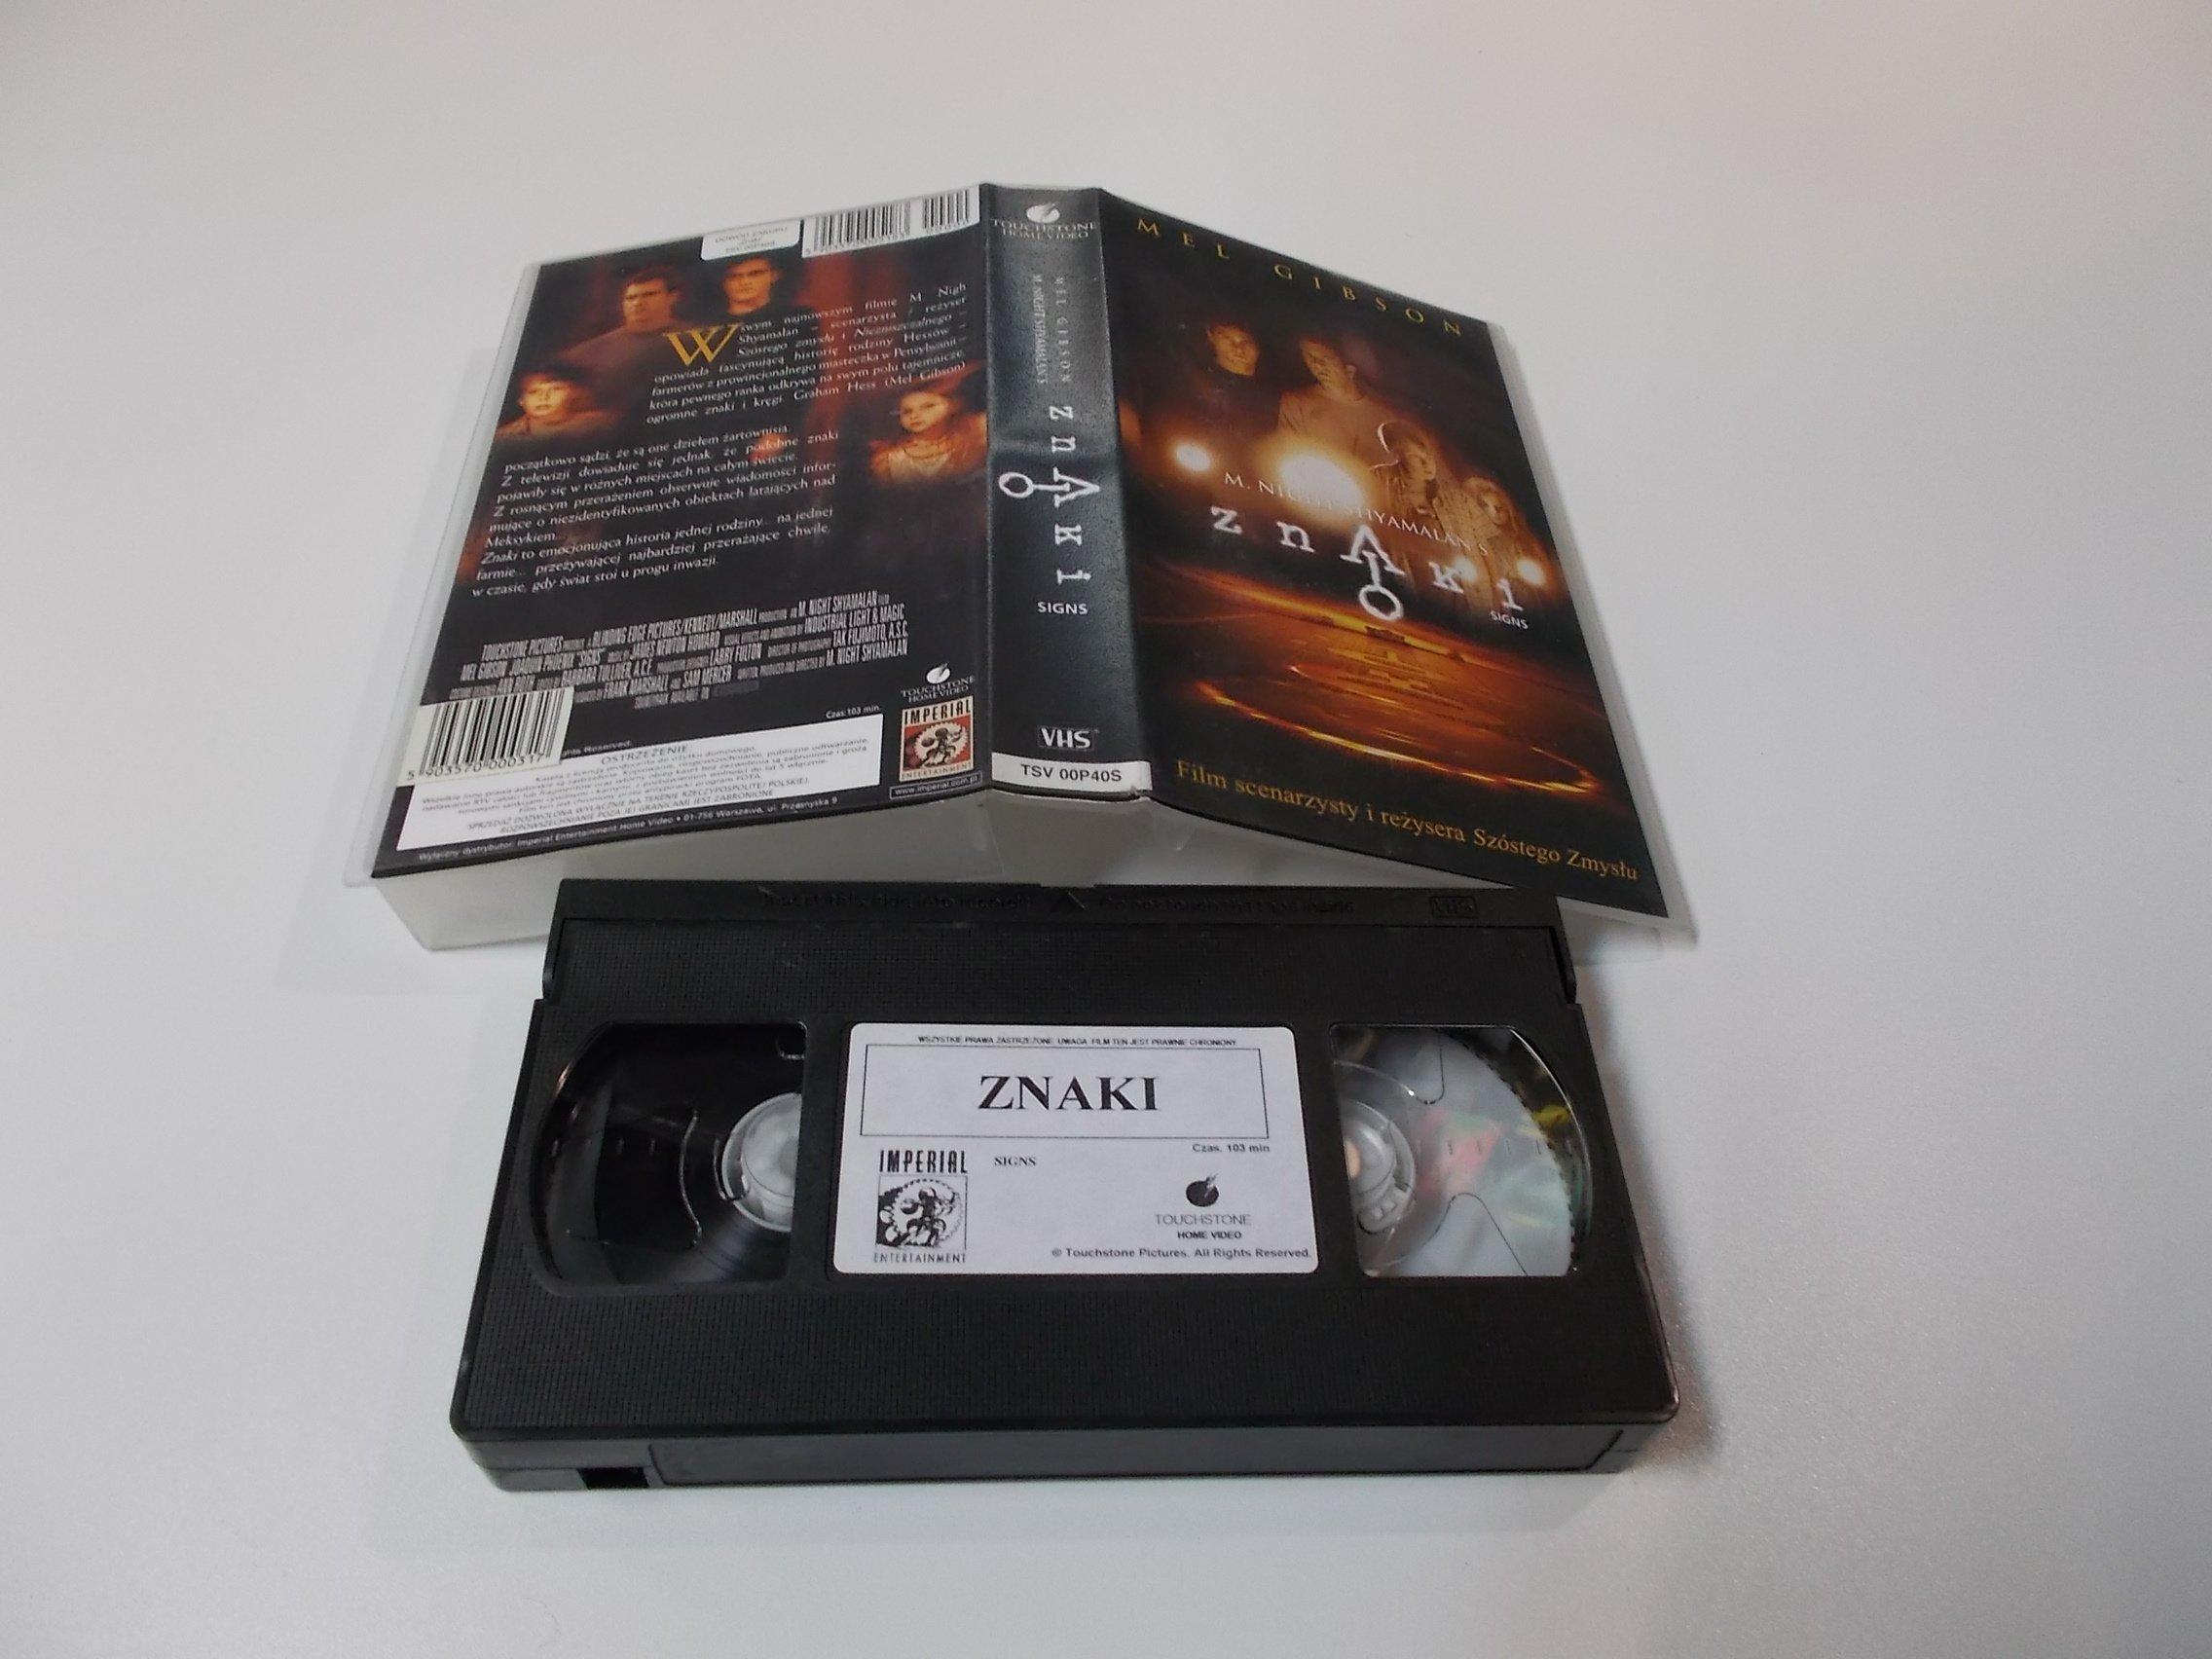 ZNAKI - VHS Kaseta Video - Opole 1630